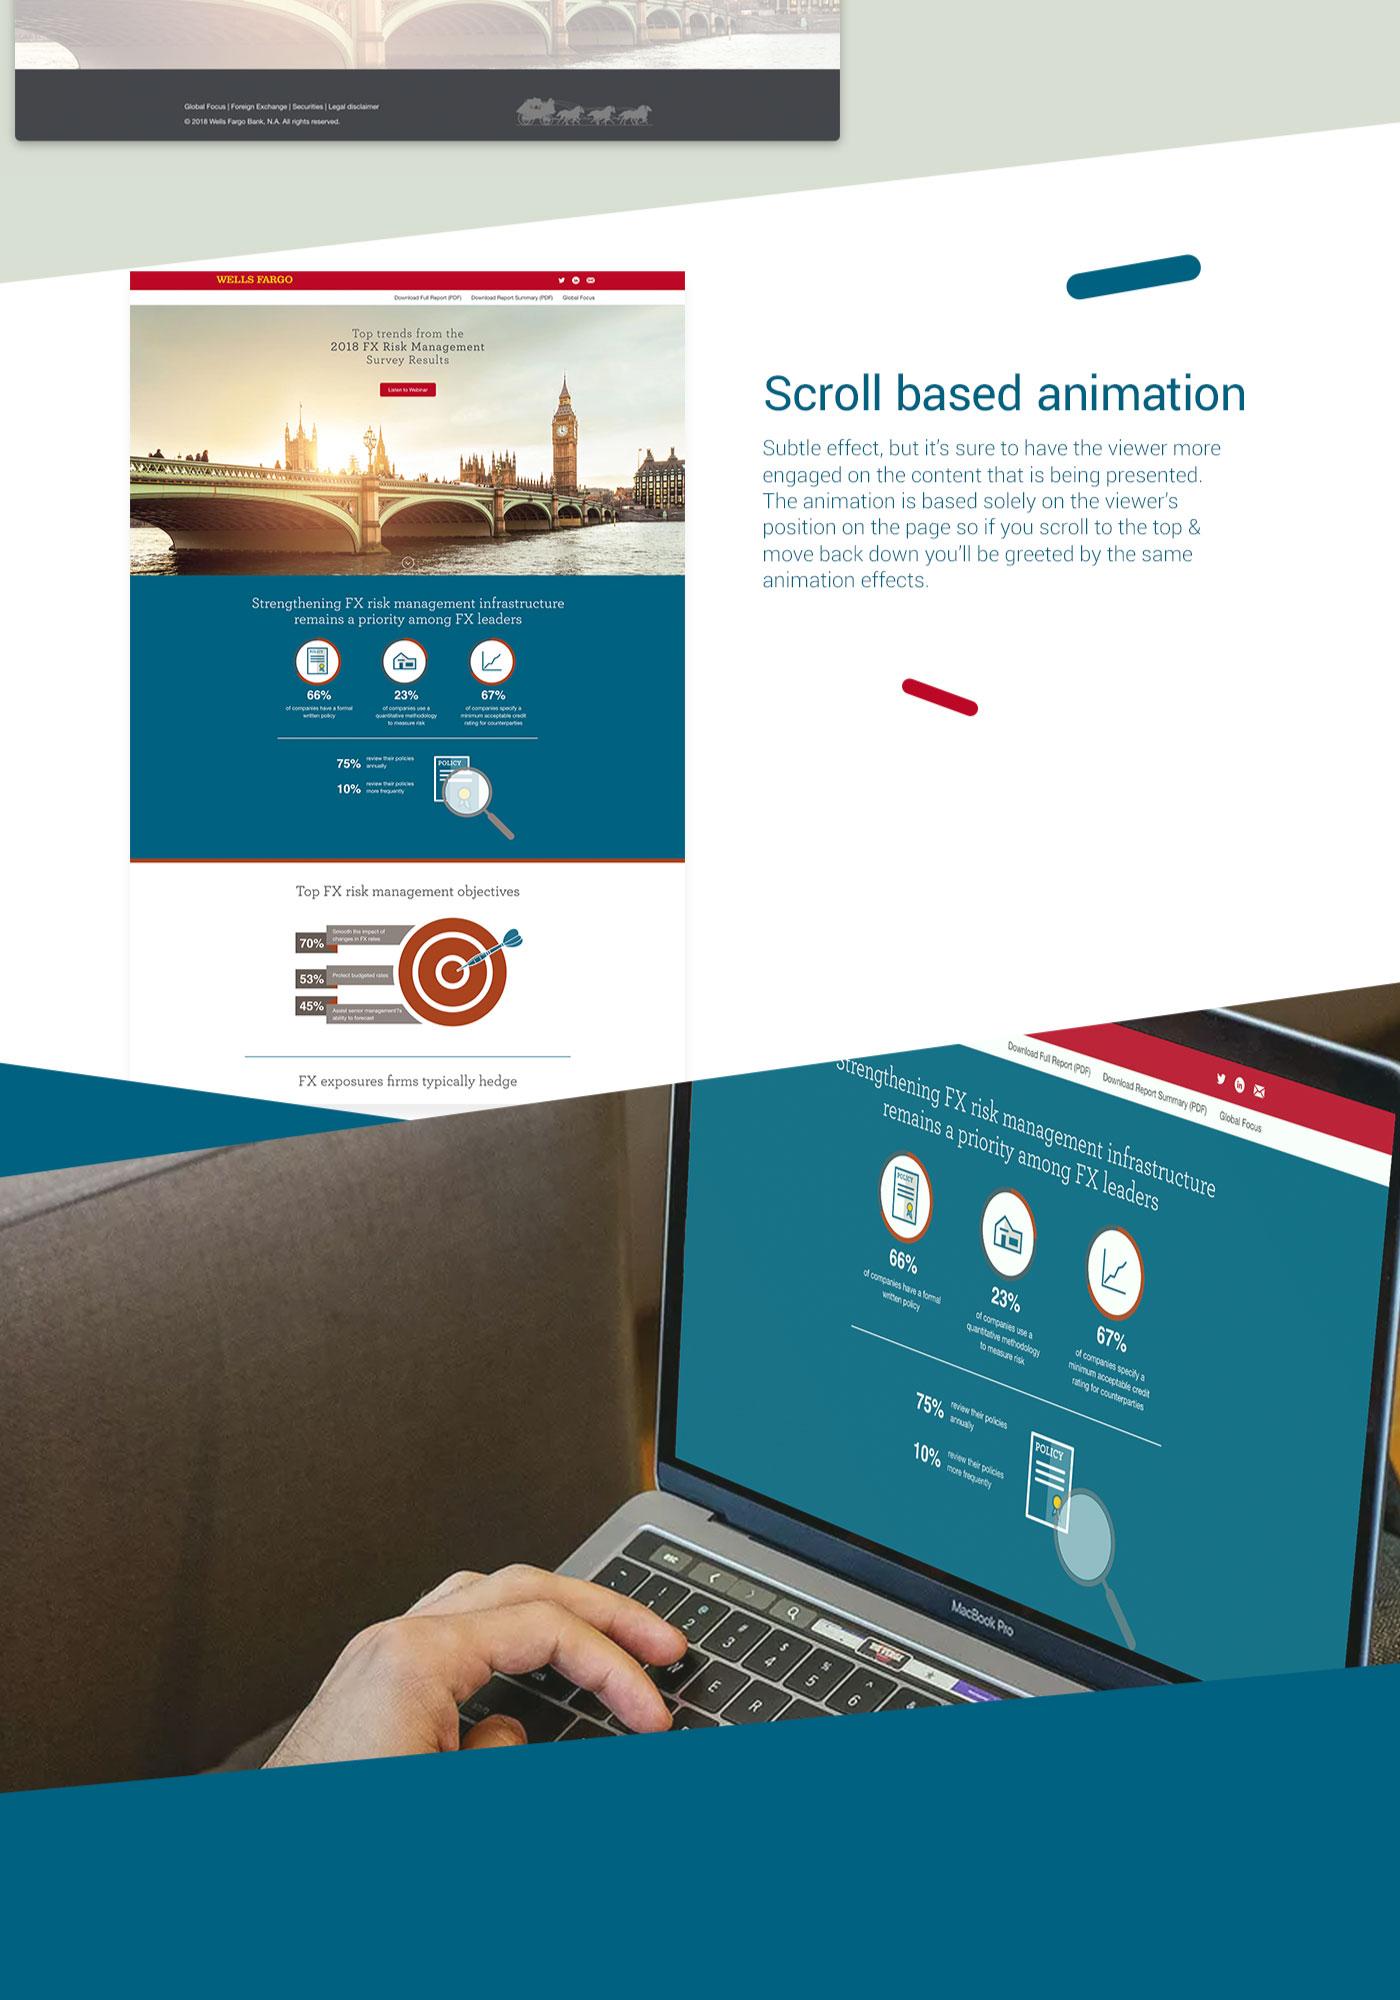 Wells Fargo FX Risk Management showcasing scroll based animation